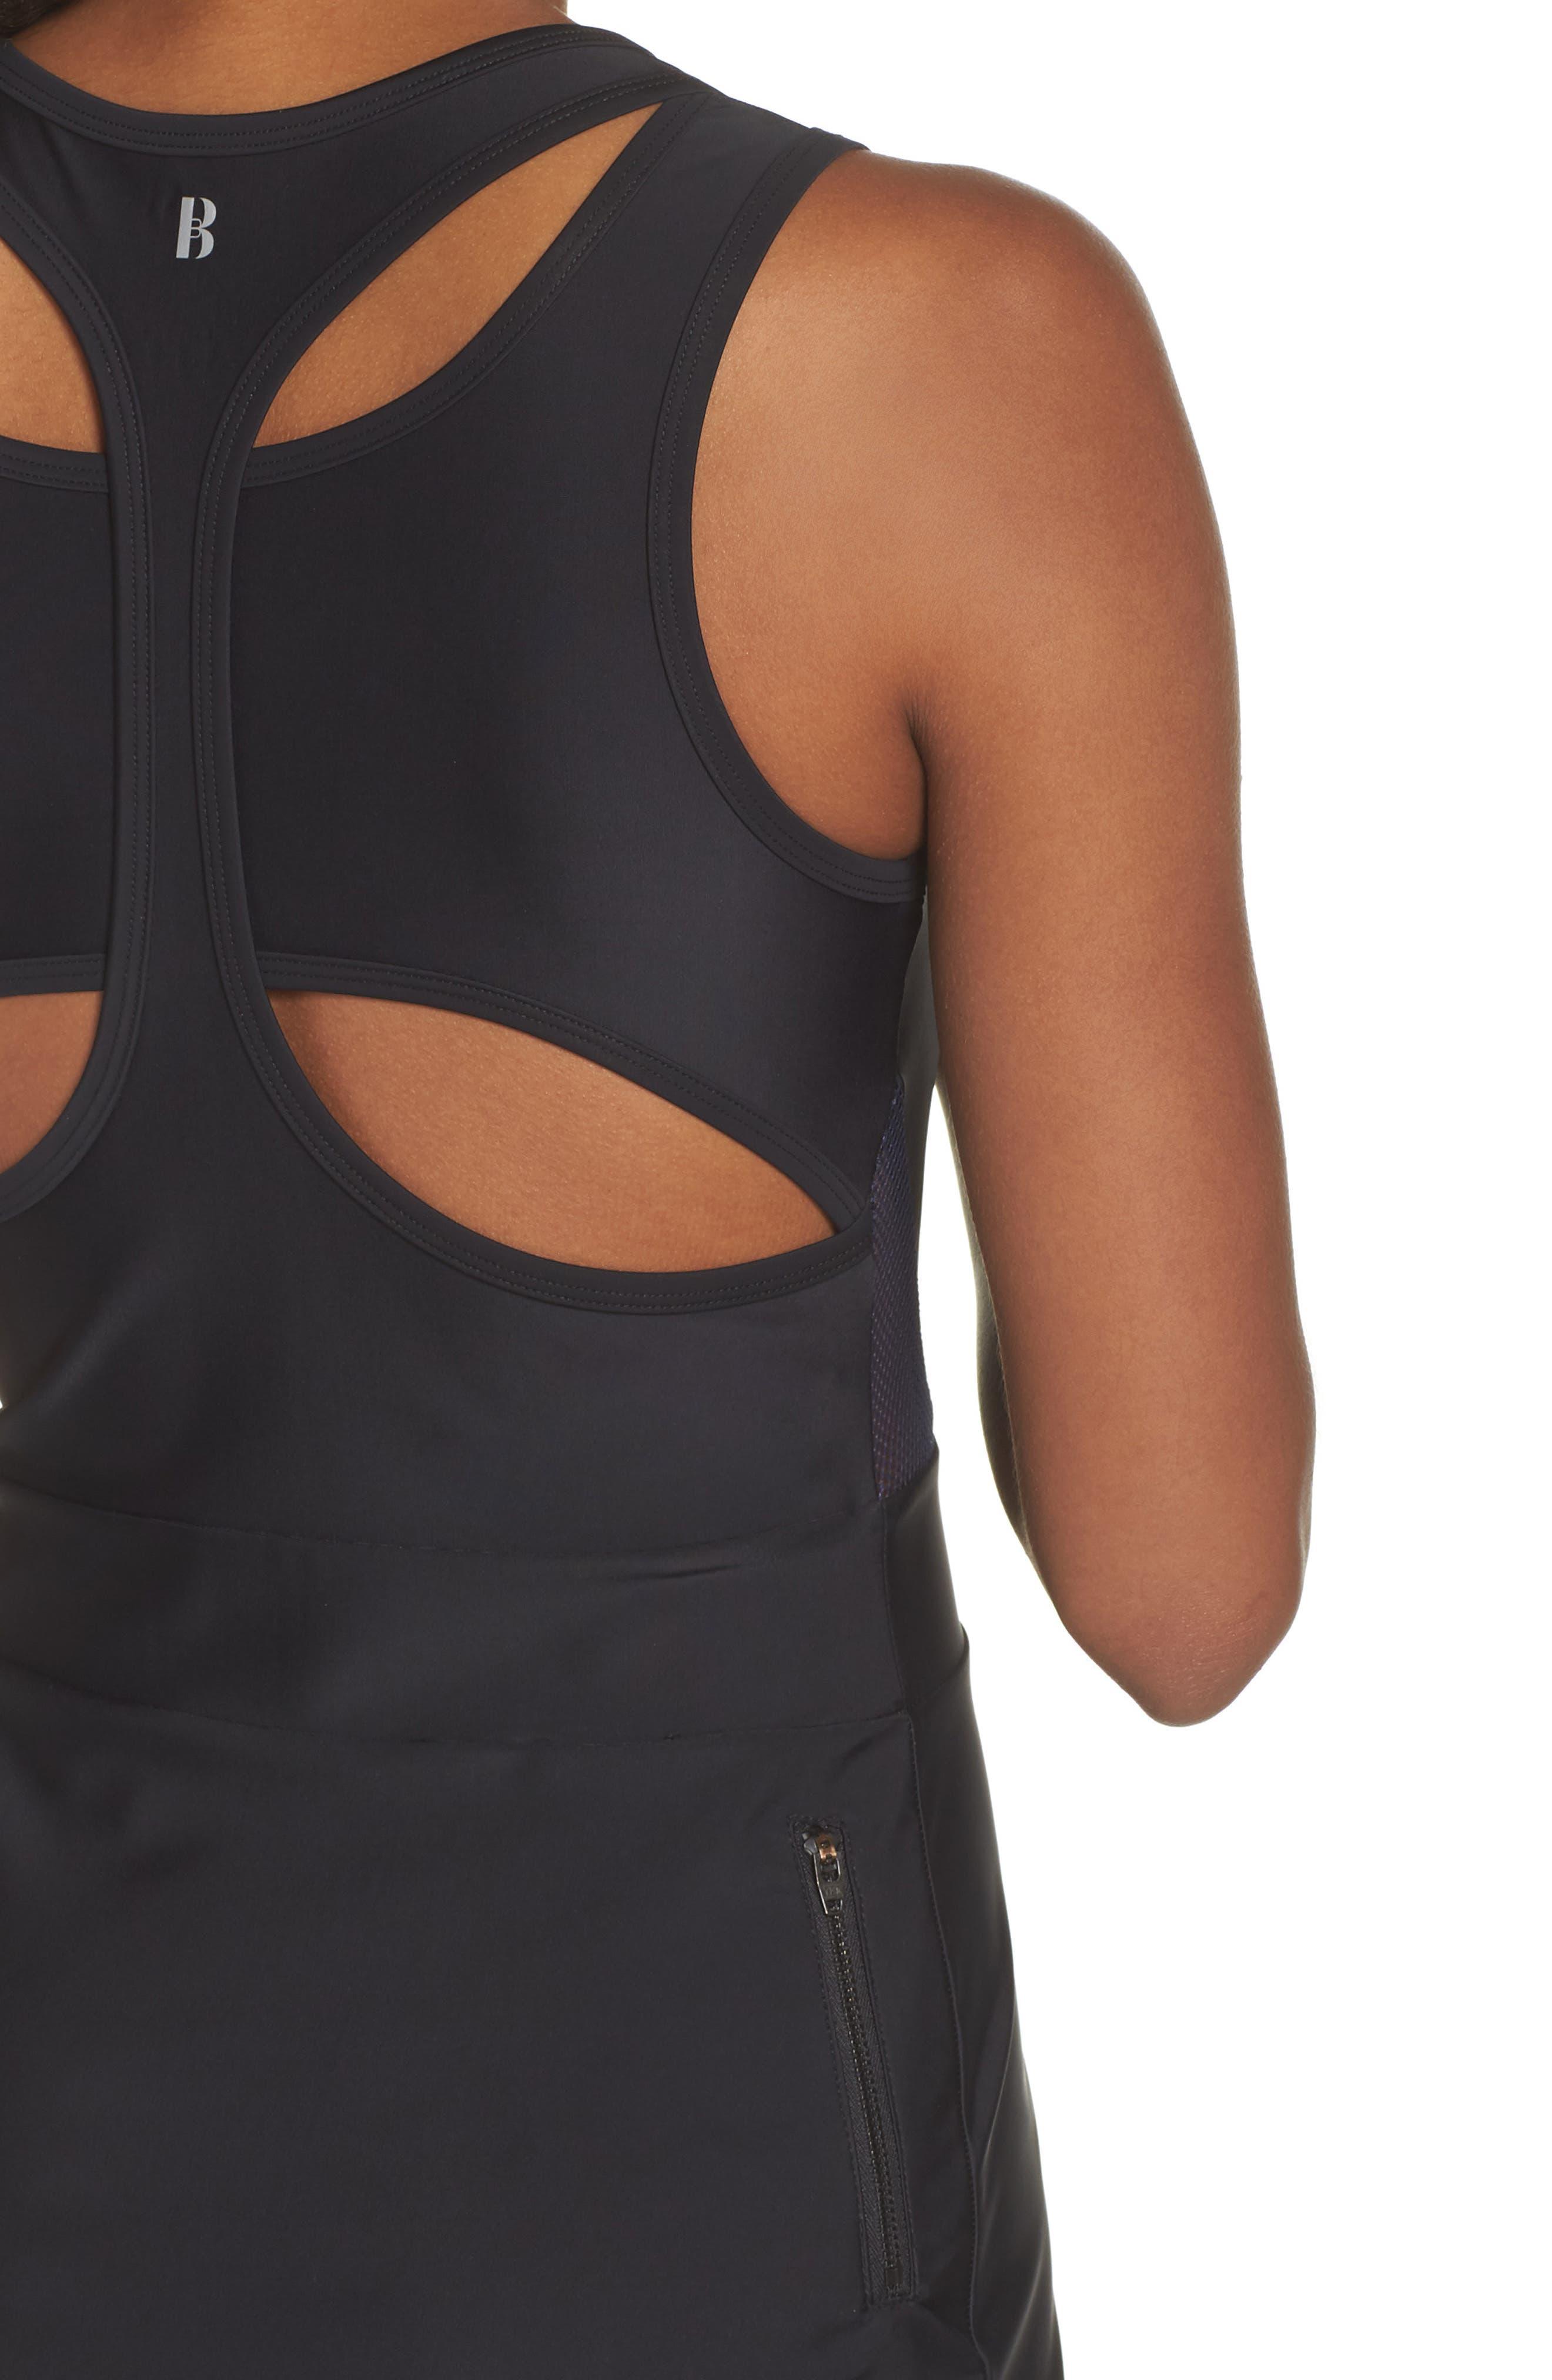 BoomBoom Athletica Tennis Dress,                             Alternate thumbnail 4, color,                             Black/ Navy